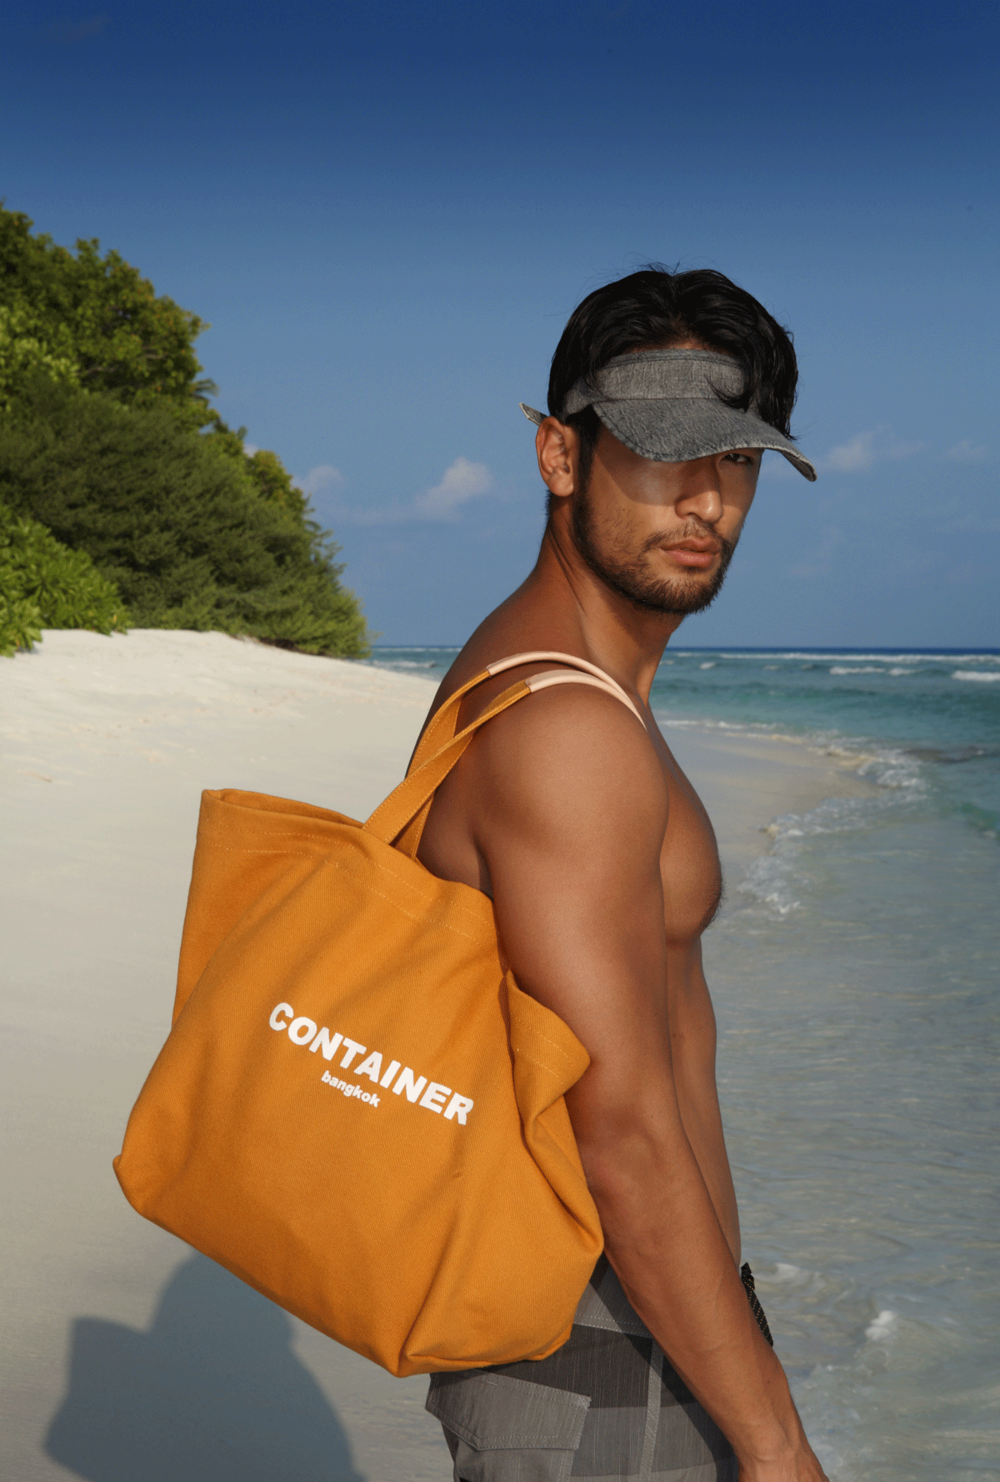 shorts : NOXX / cap : QUIKSILVER / bag : CONTAINER